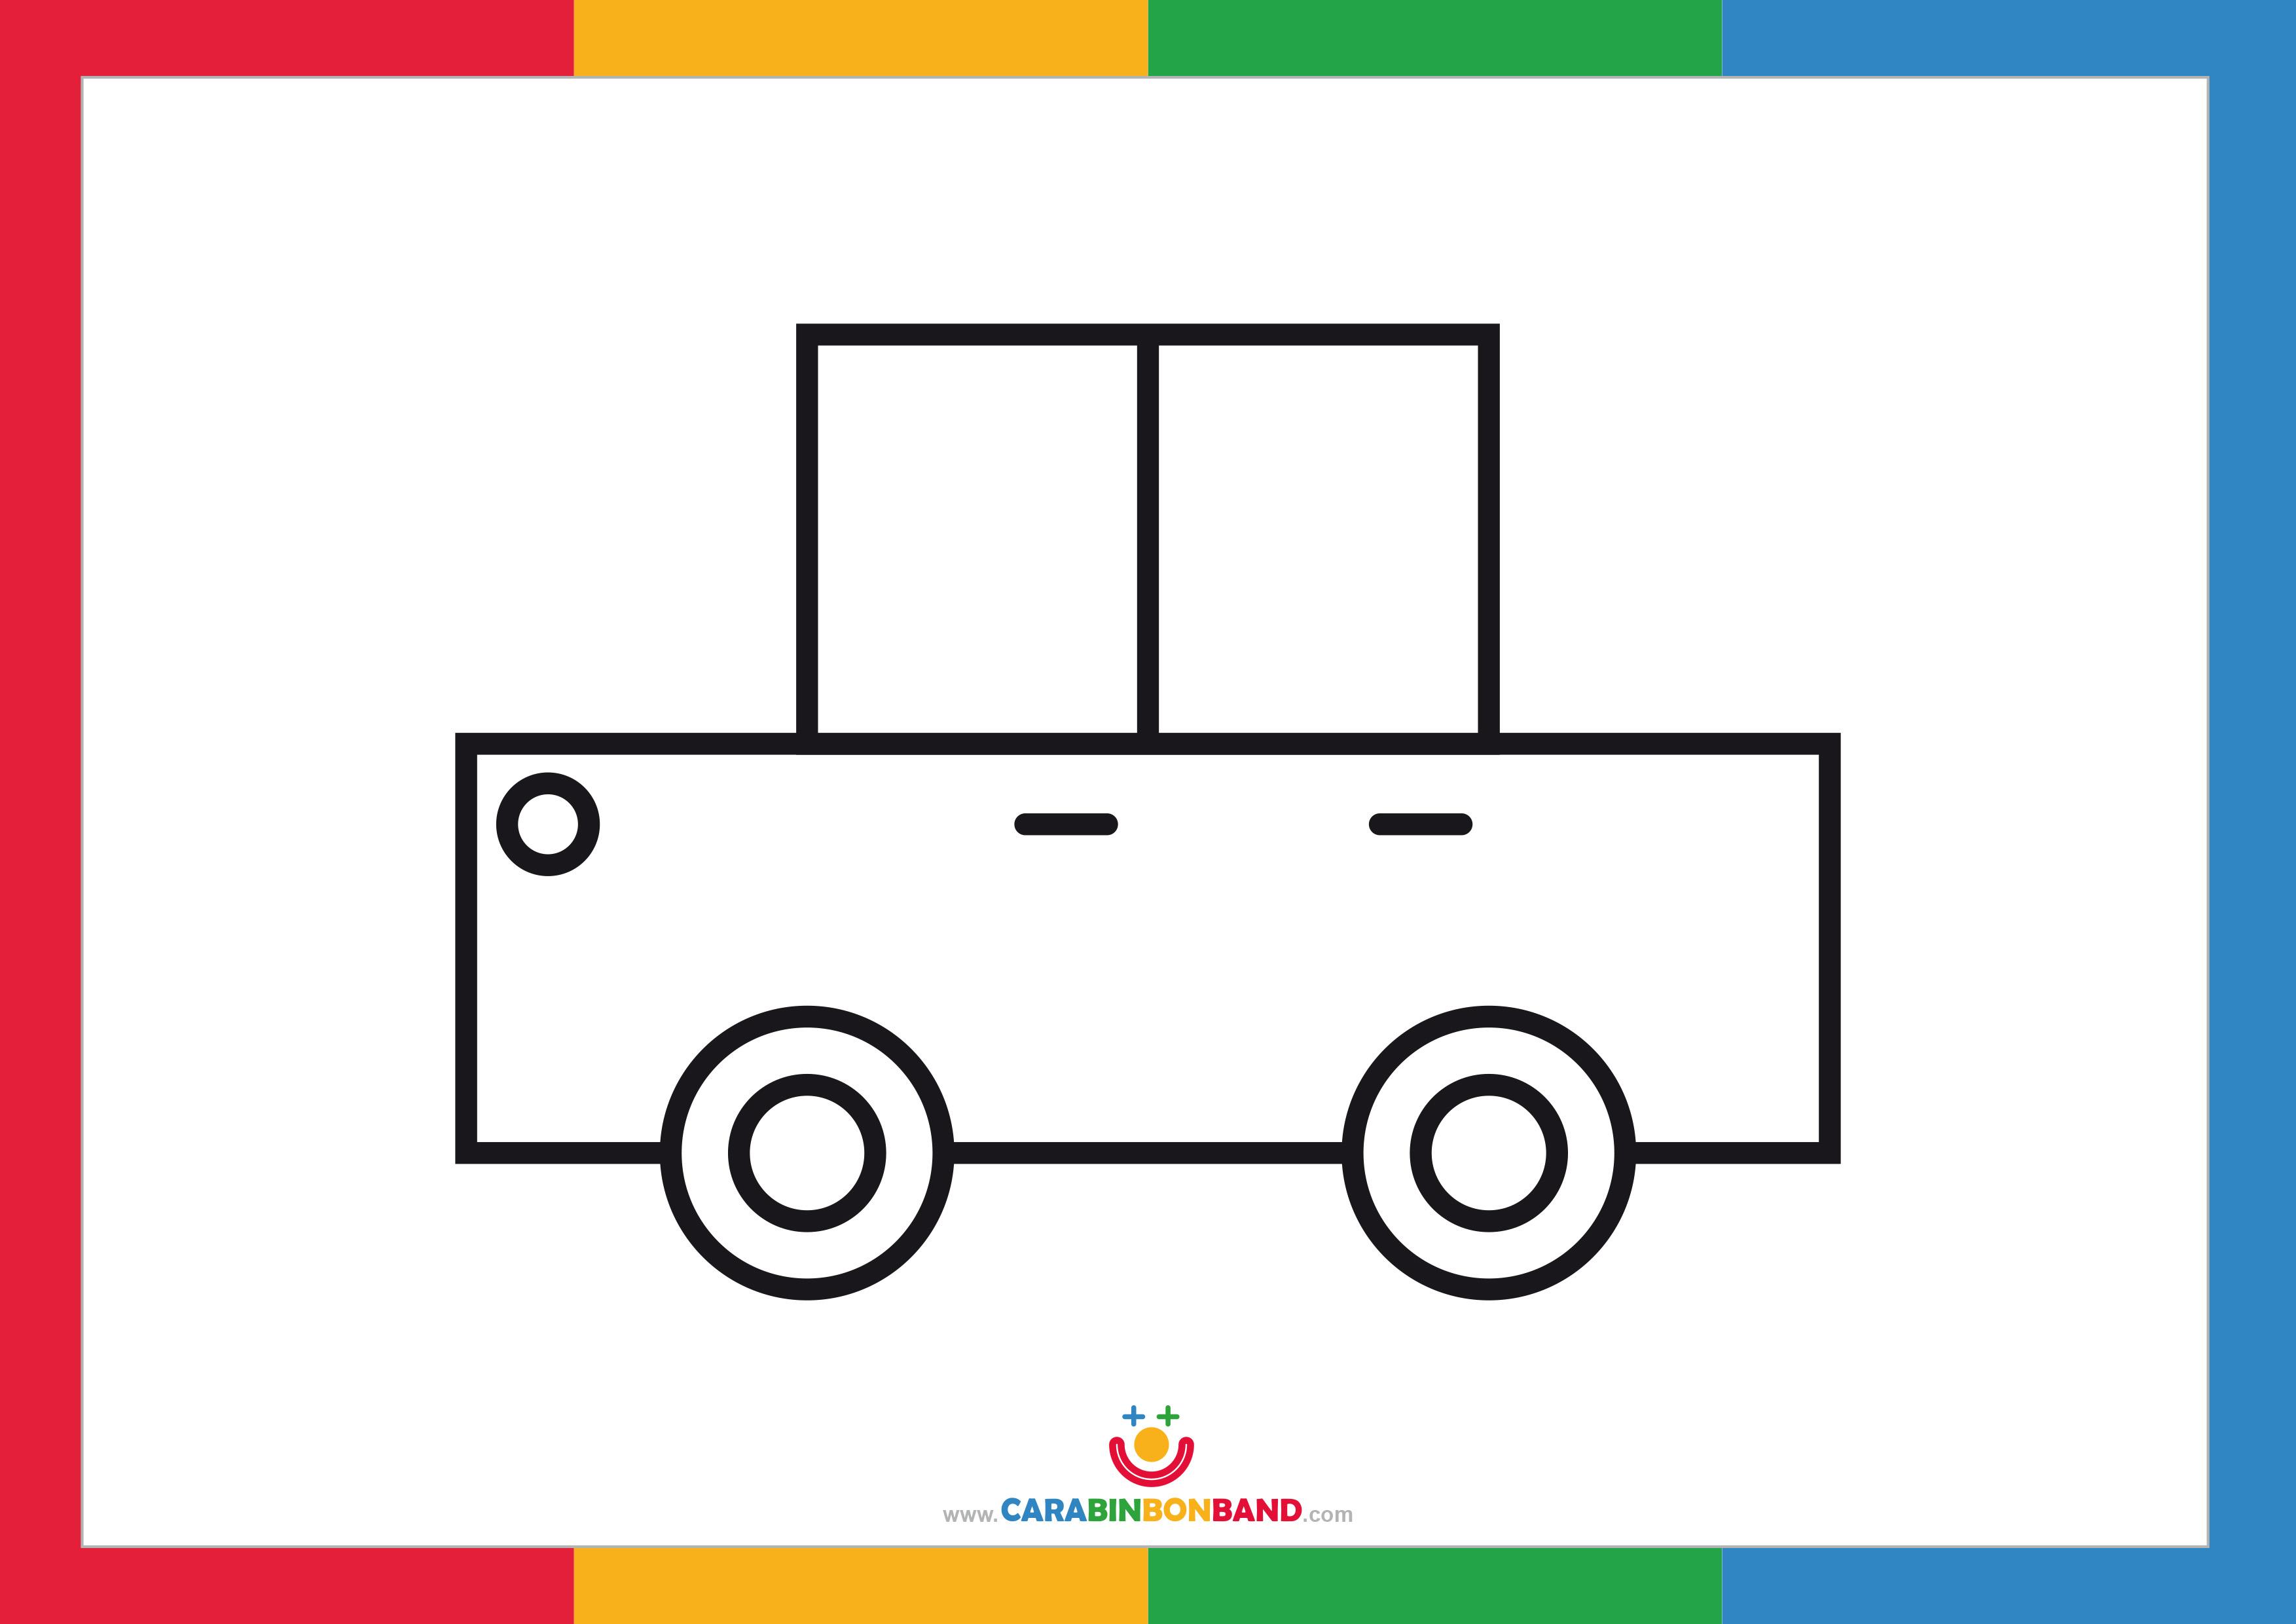 Dibujos Mas Fasiles Para Dibujar: Cómo Dibujar Un Coche Fácil Para Niños